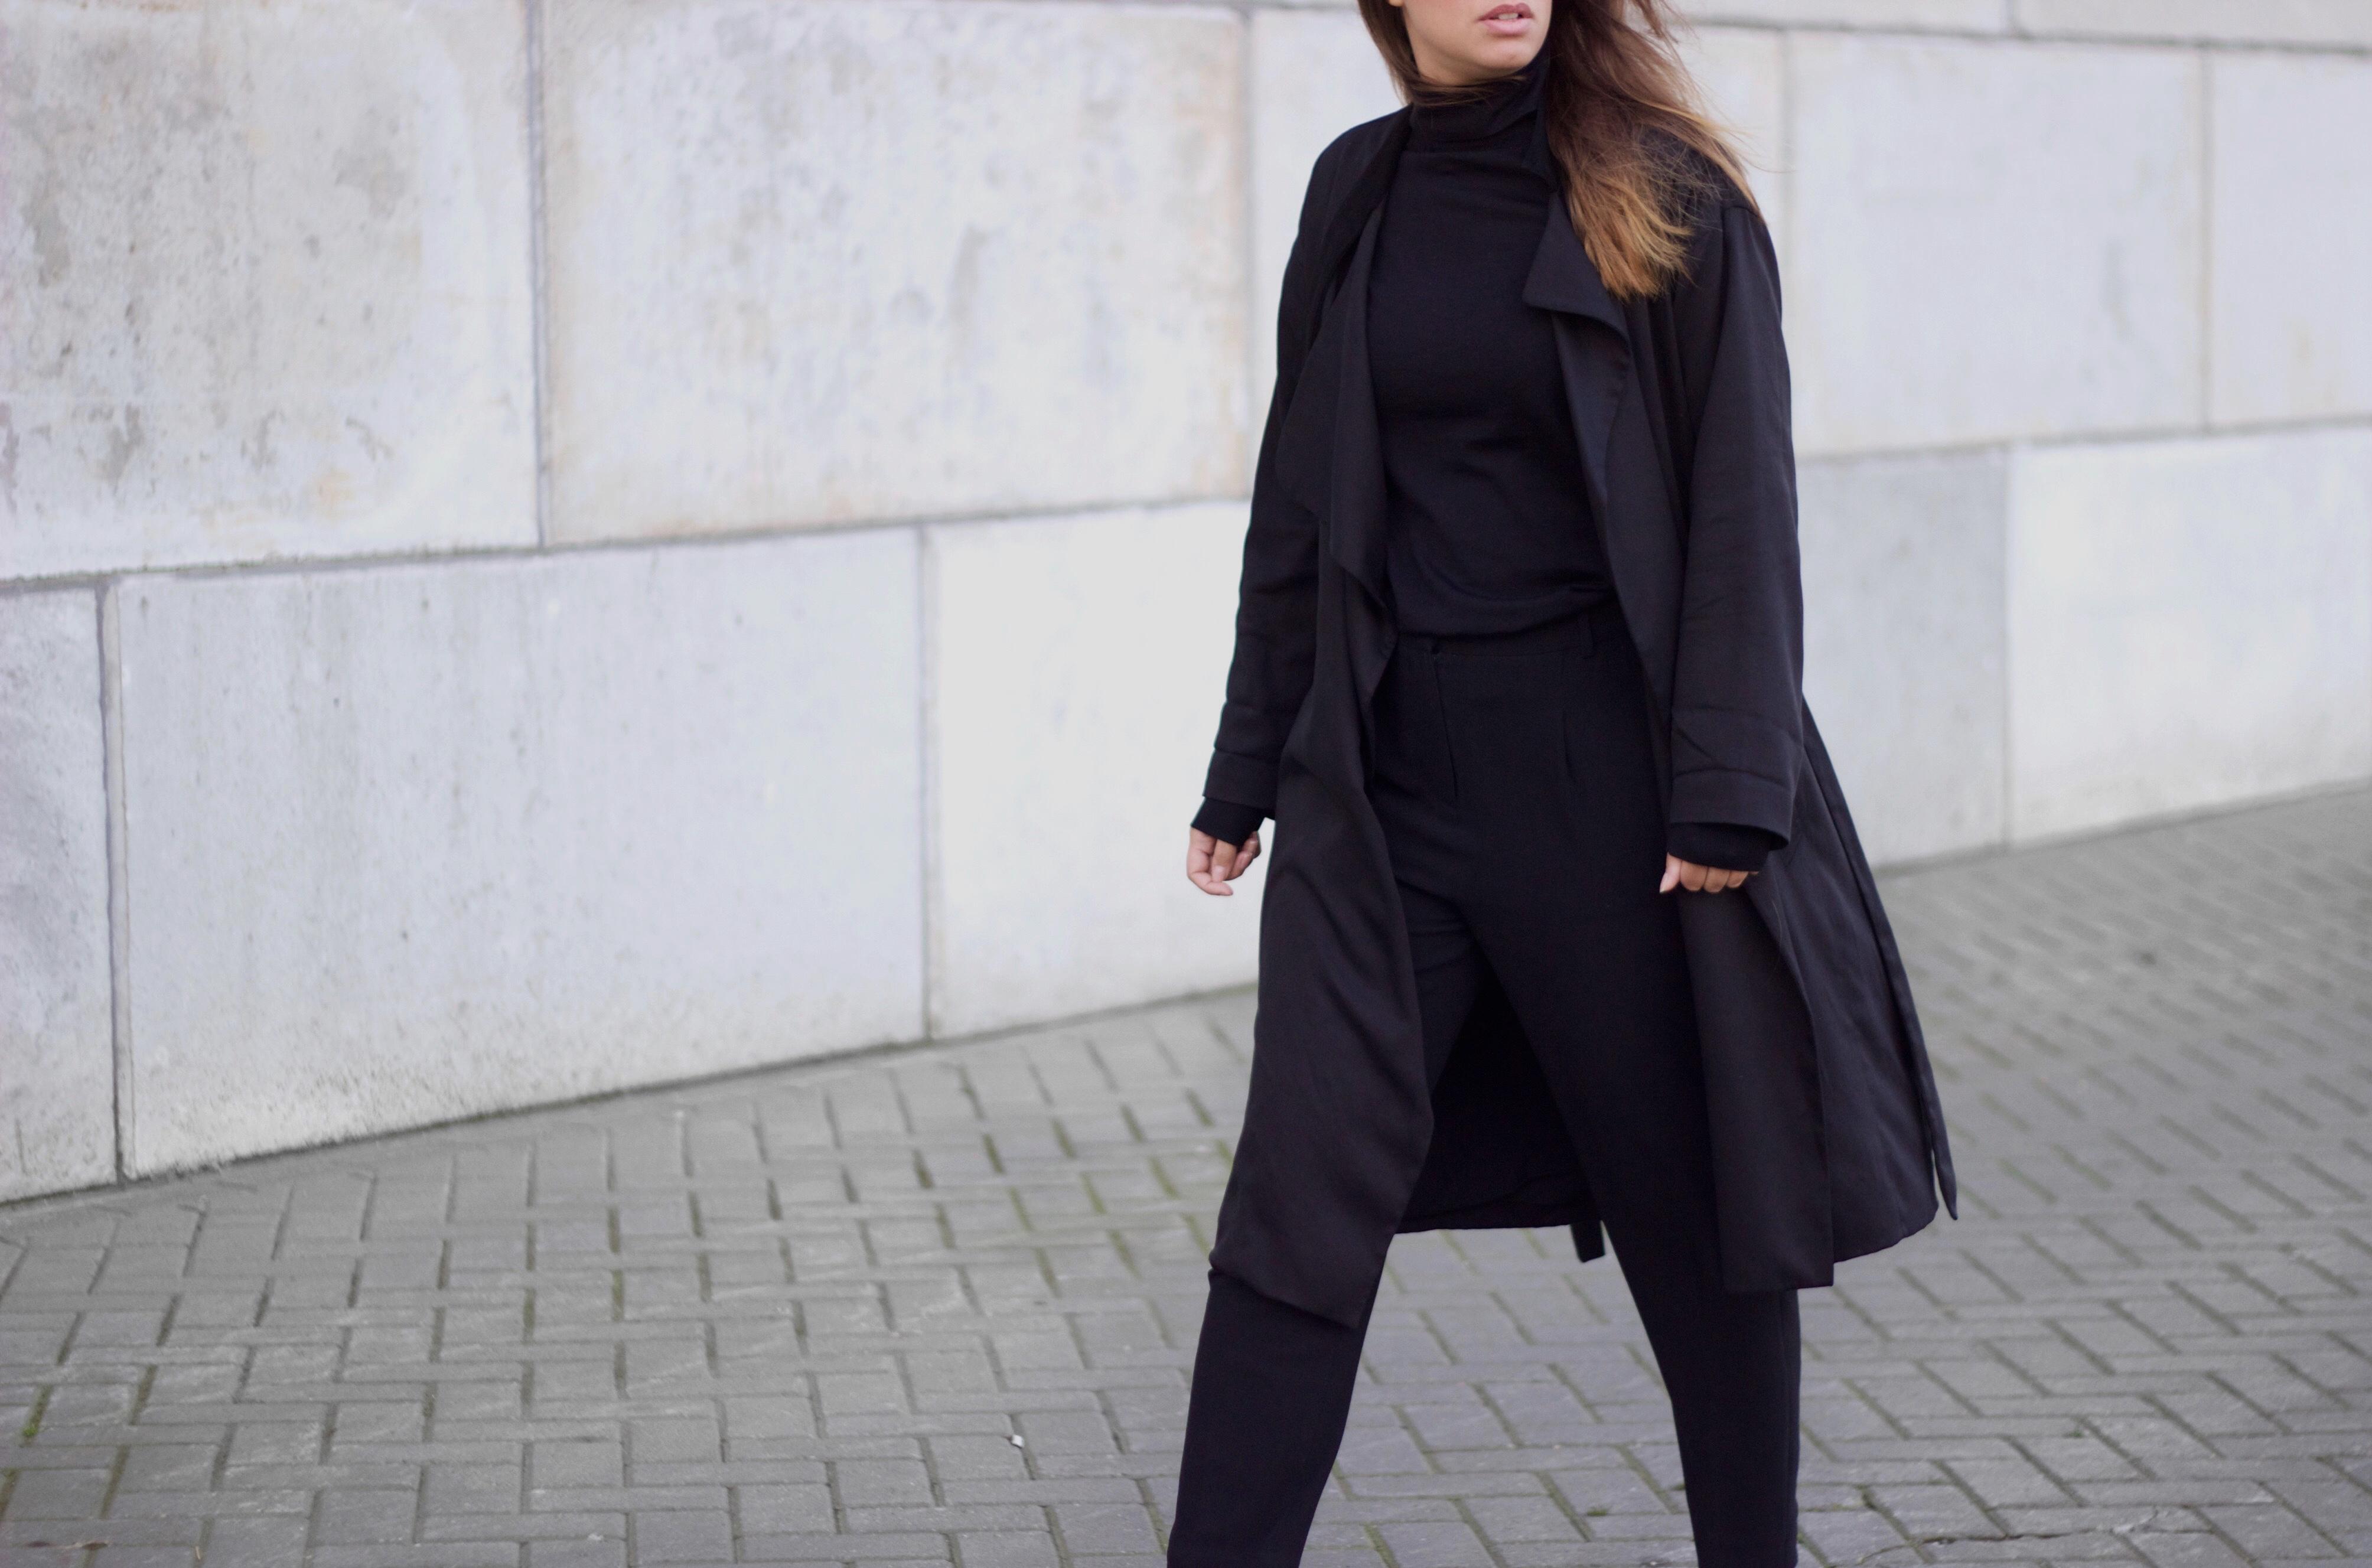 Garment-black-essentials-all-saints-allsaints